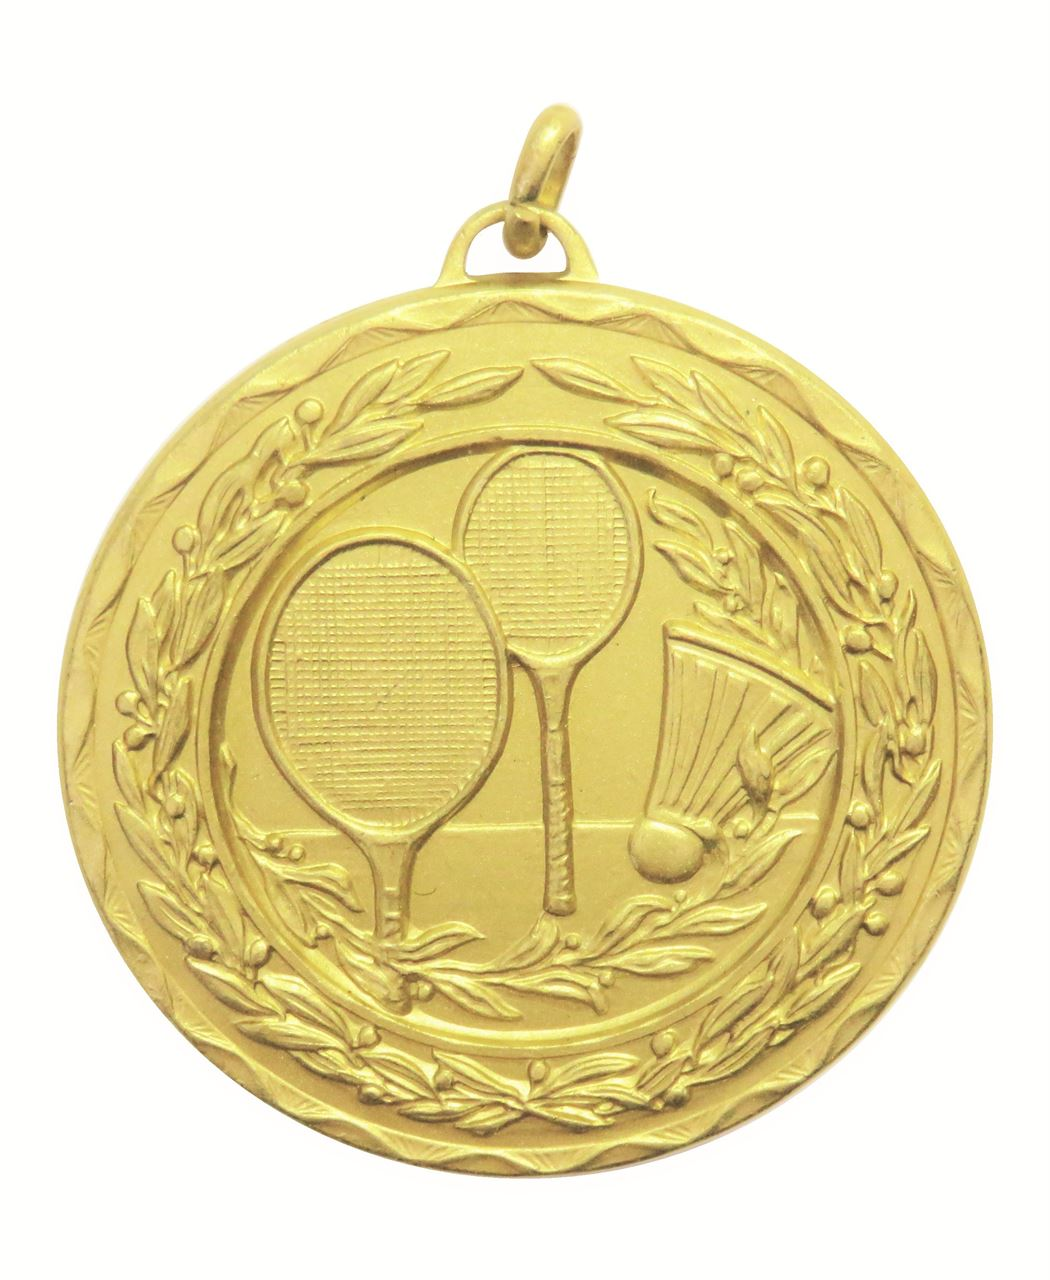 Gold Laurel Economy Badminton Medal (size: 50mm) - 4181E